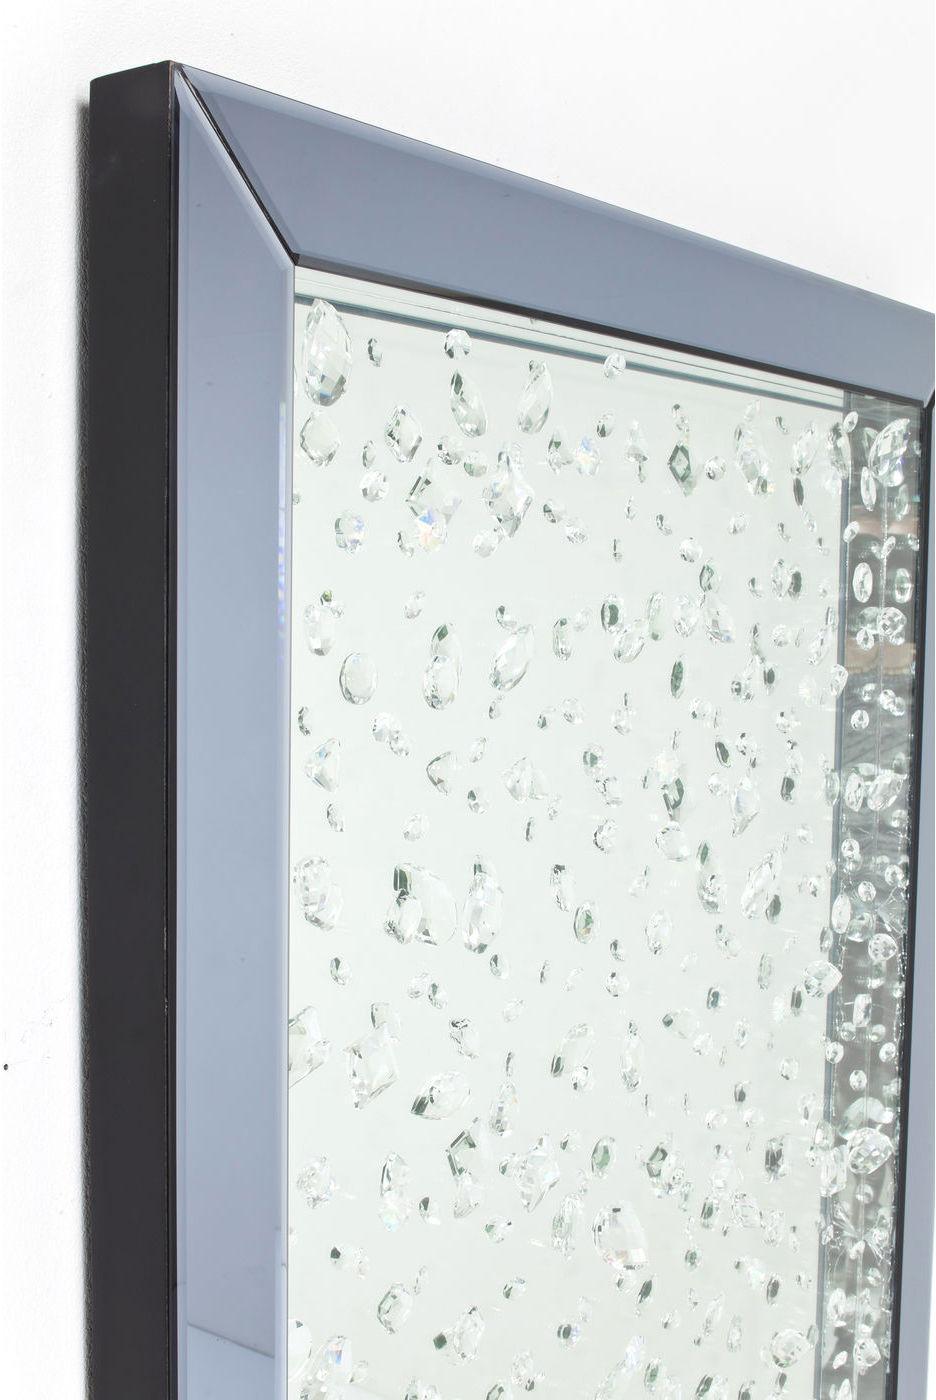 kare design spiegel raindrops 120x80cm meubelen verlichting. Black Bedroom Furniture Sets. Home Design Ideas